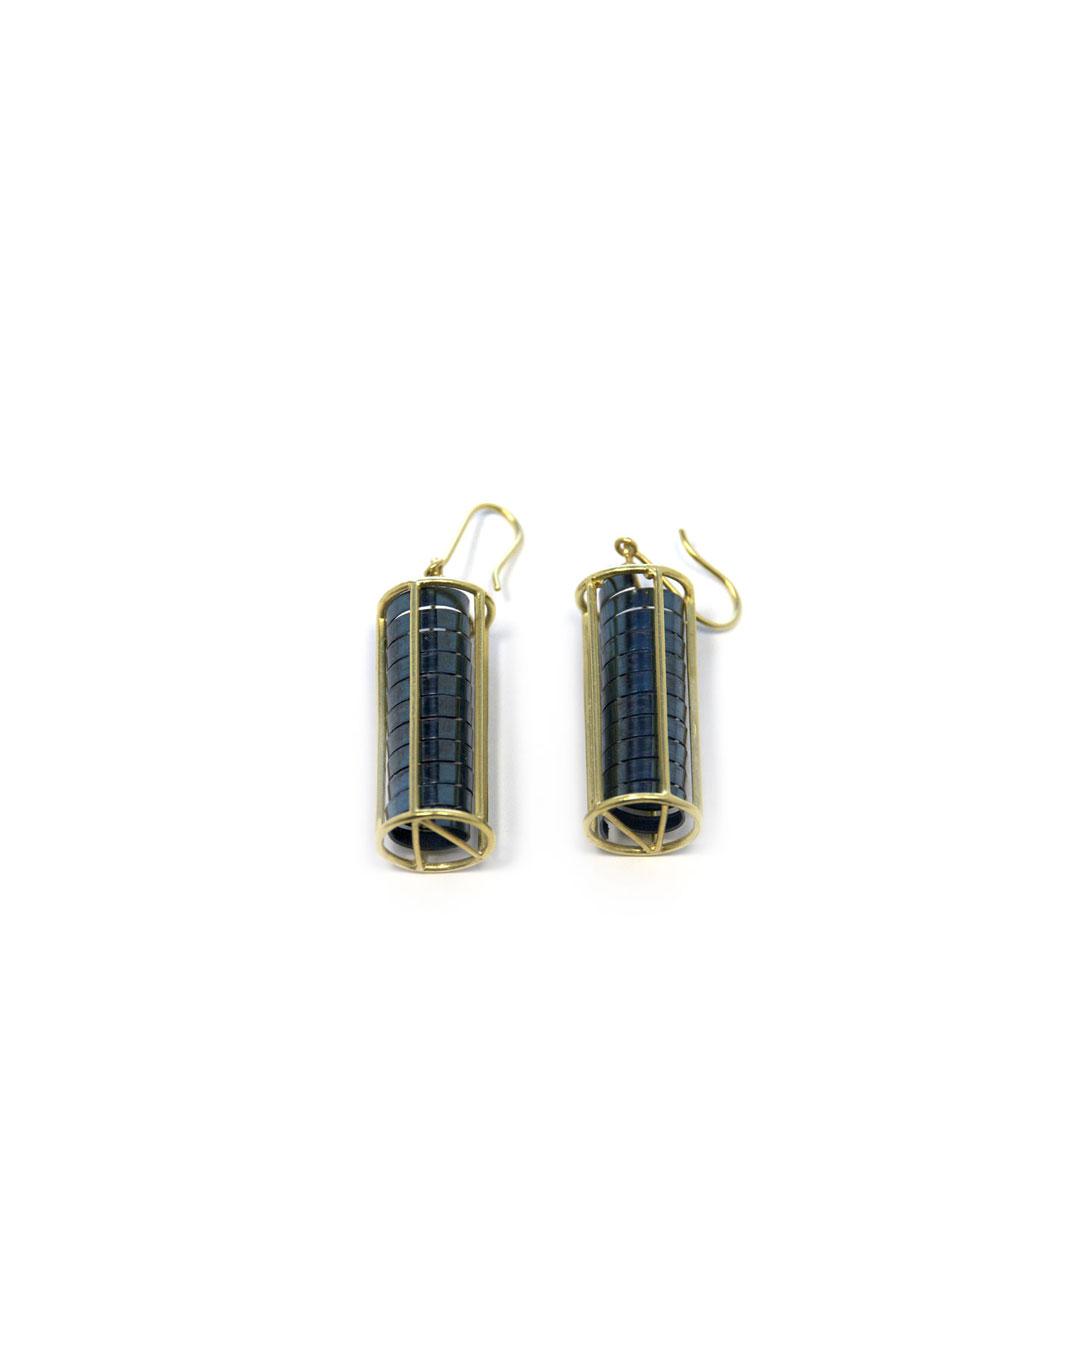 Okinari Kurokawa, untitled, 2013, earrings; 18ct gold, stainless steel, 39 x 13 x 13 mm, €1450